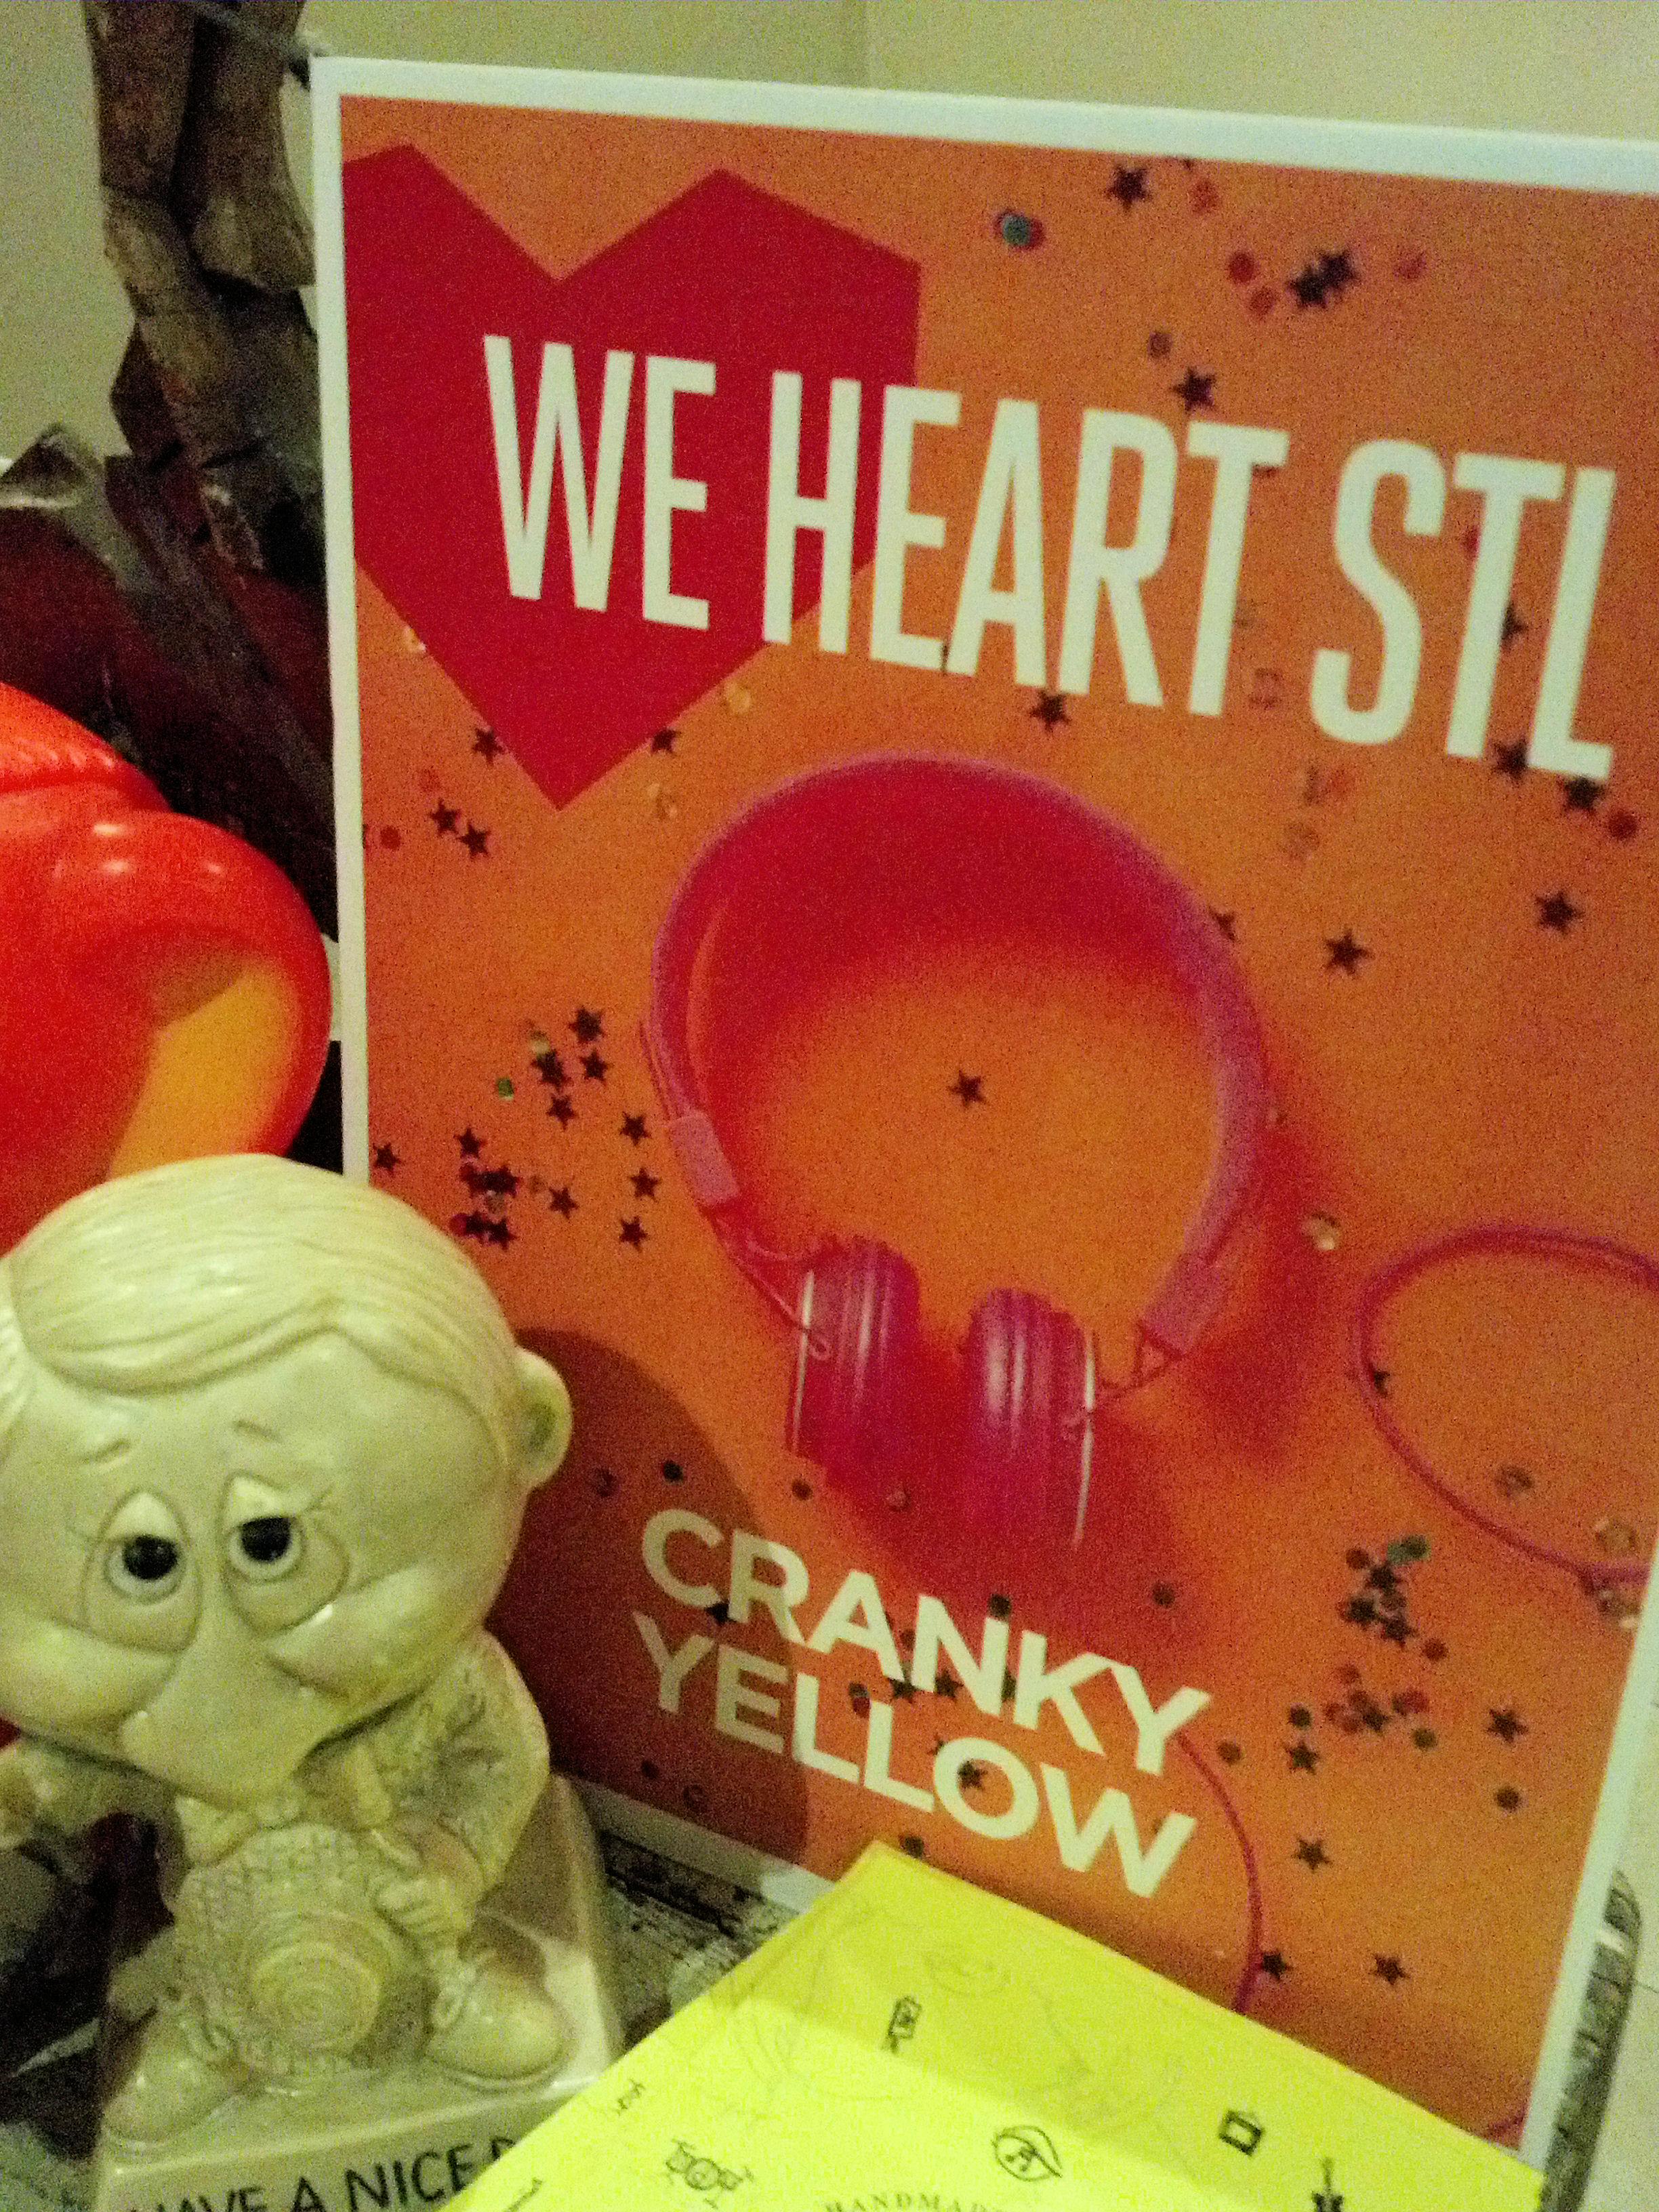 We Heart STL Cranky Yellow